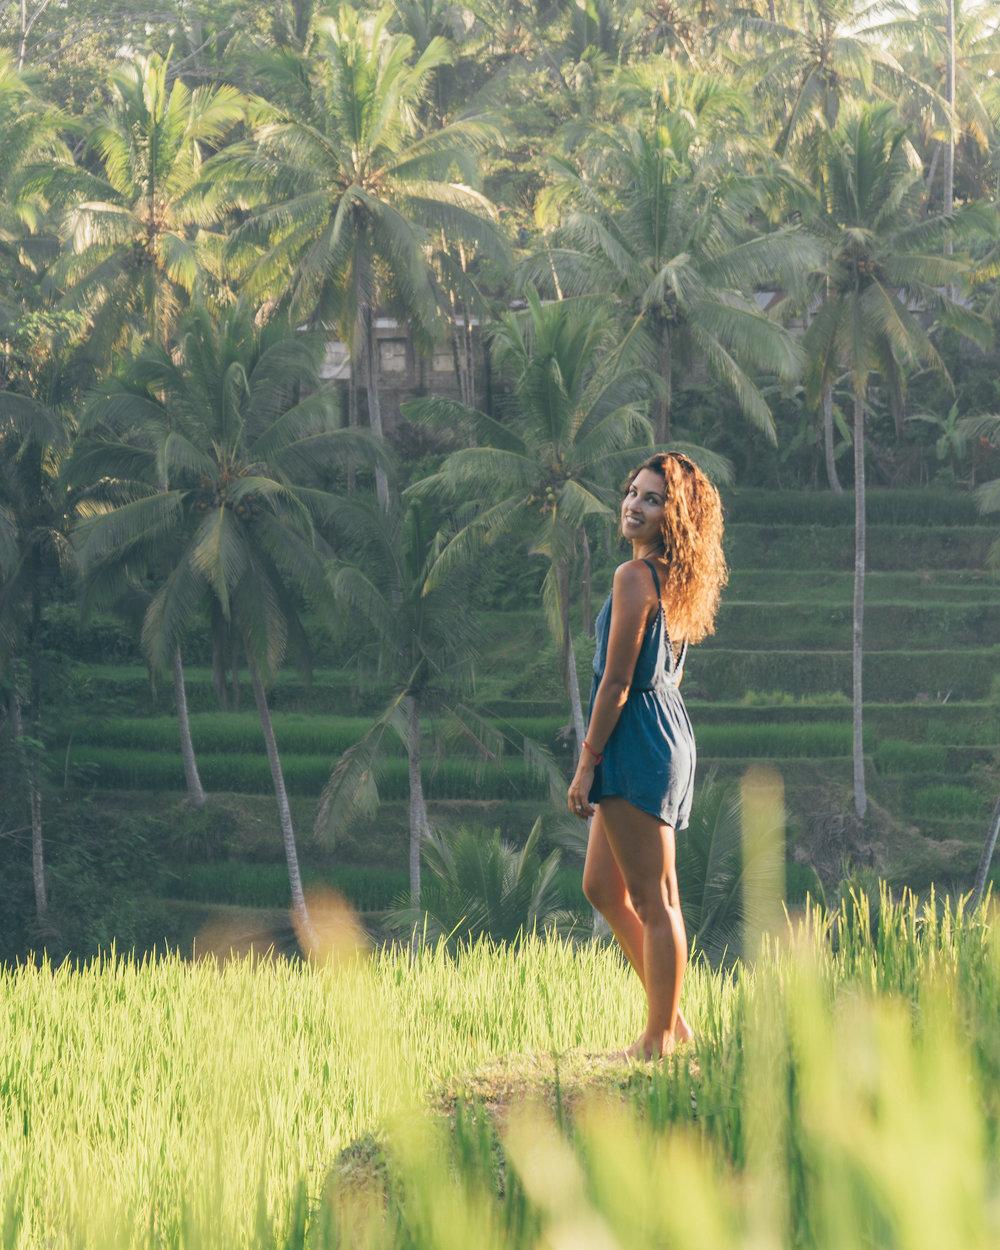 Tegallalang Rice Terraces, Ubud, Bali